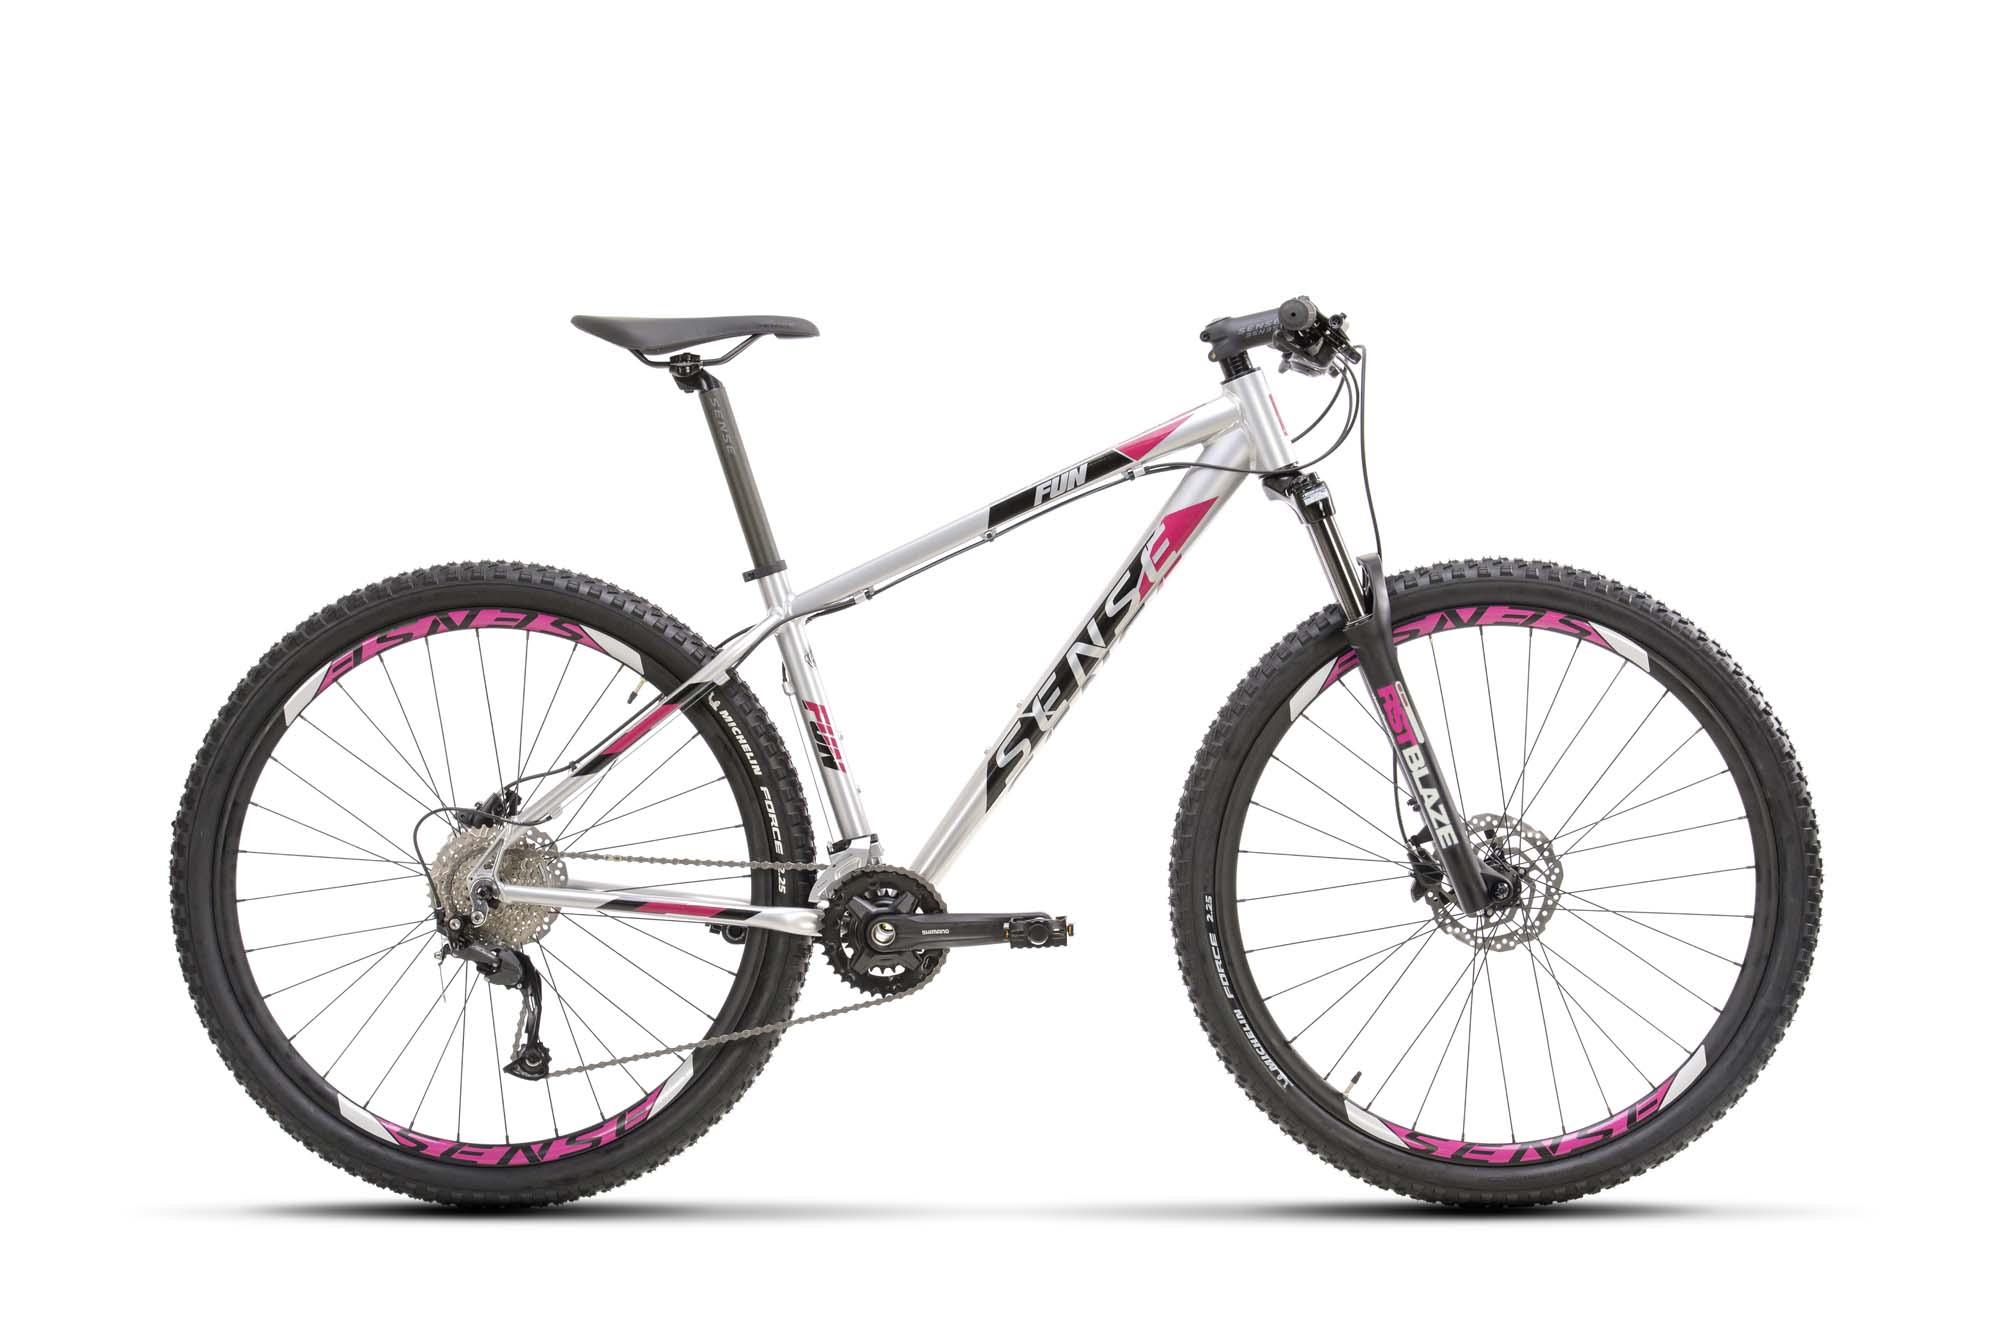 BICICLETA FUN EVO 2021/22 ALUM/ROXO TAM S